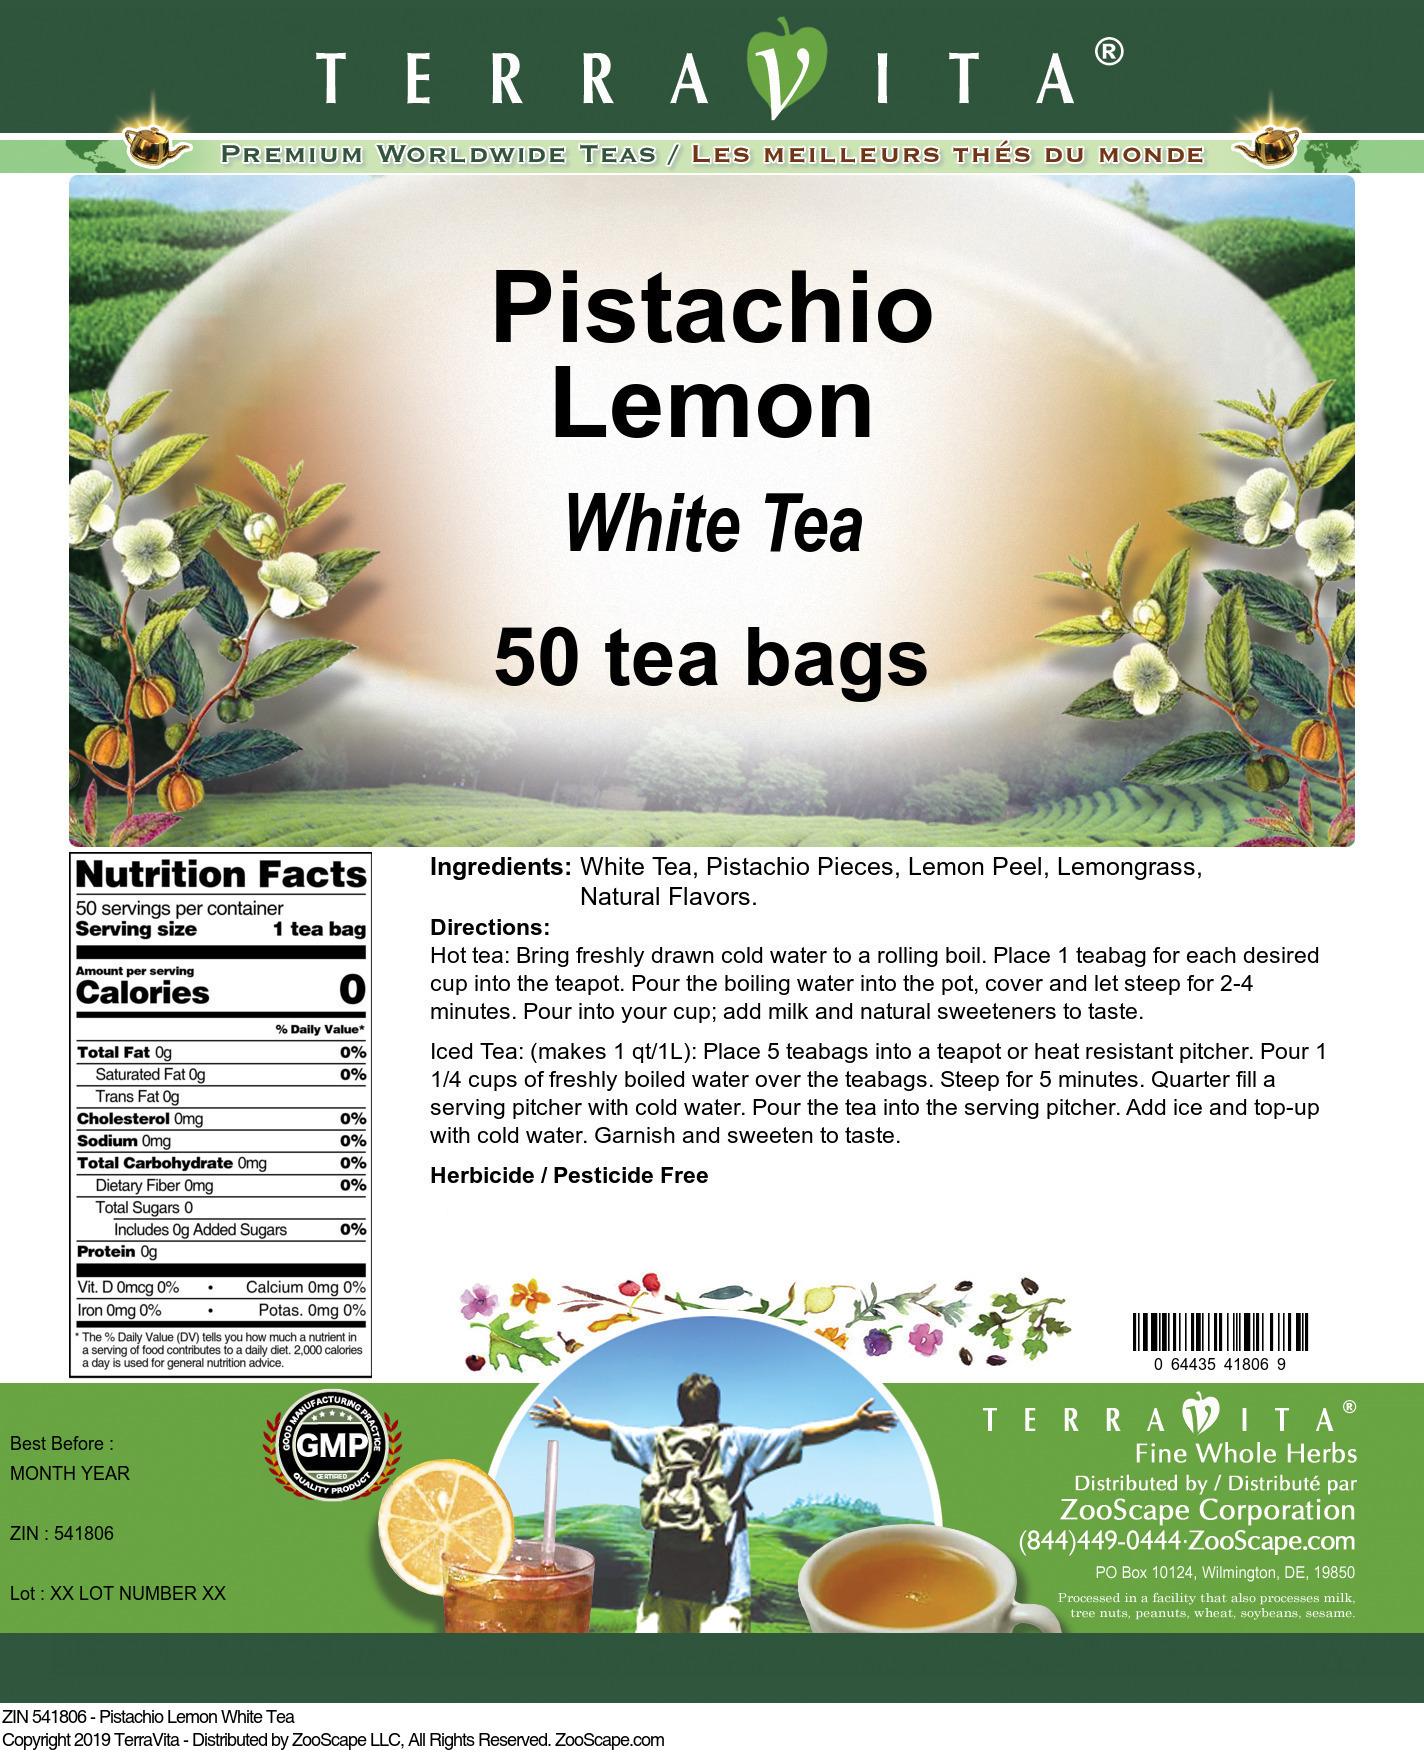 Pistachio Lemon White Tea